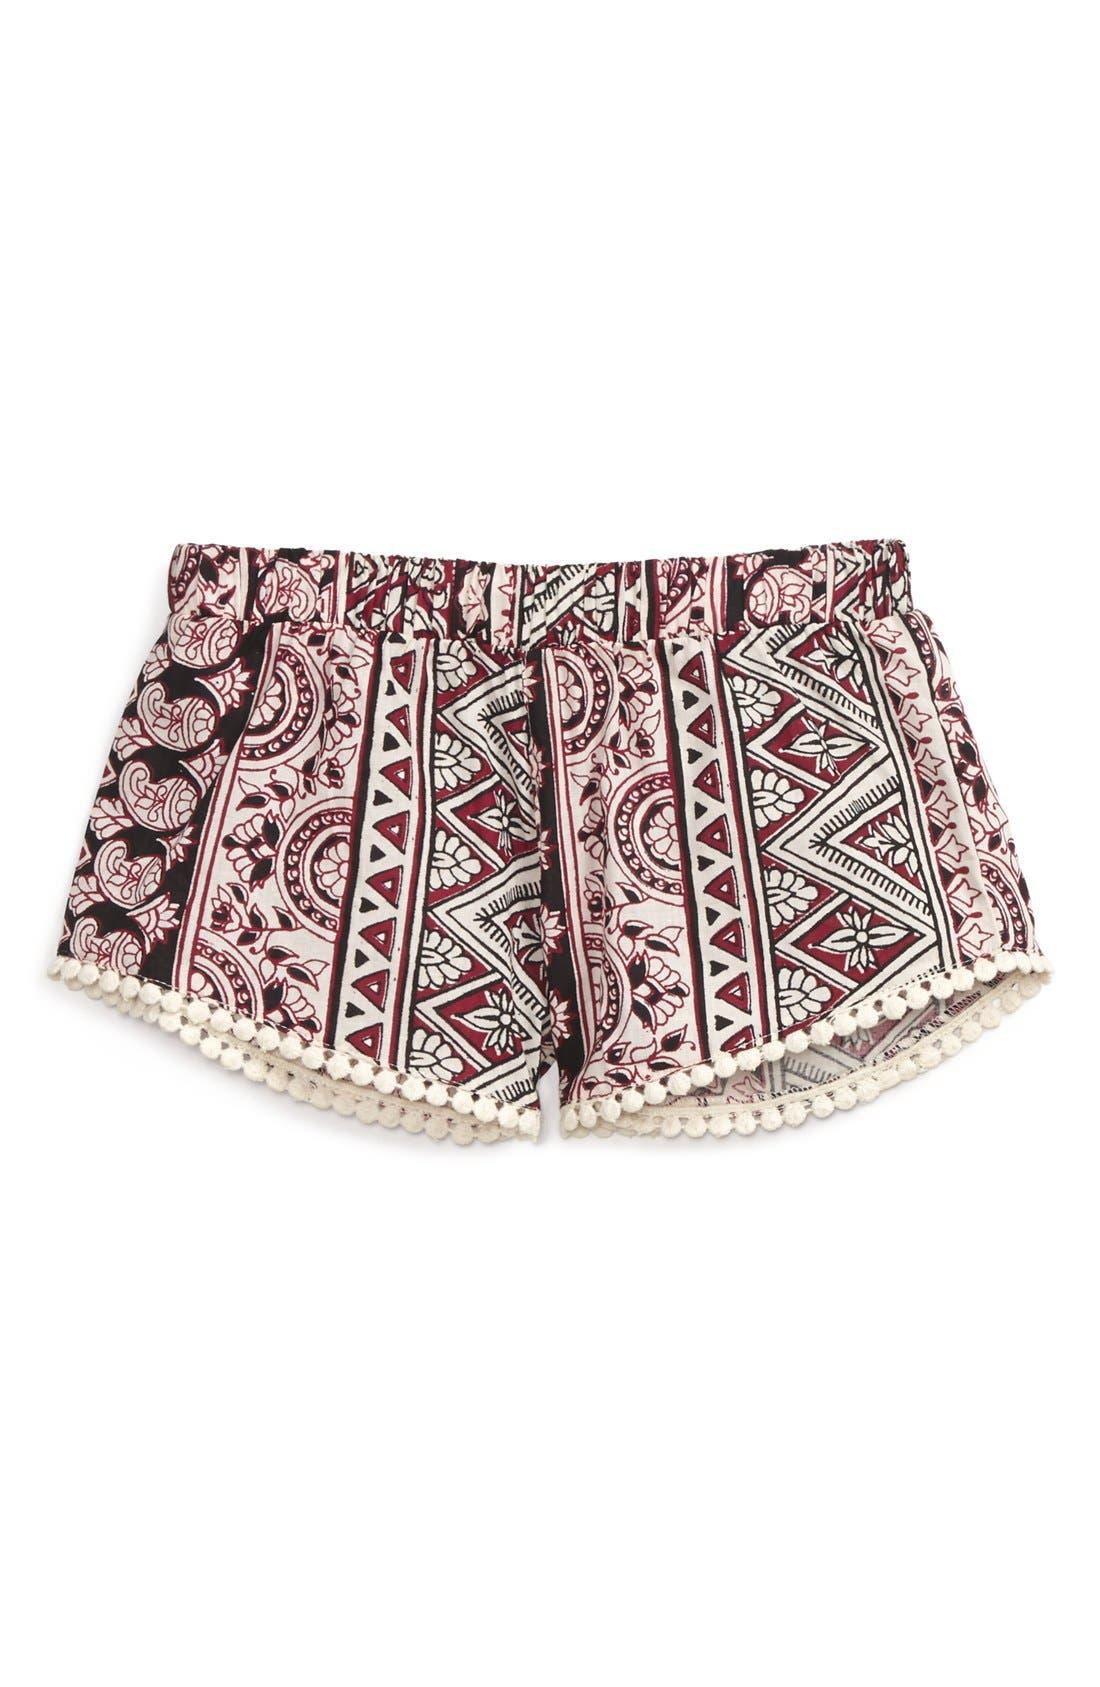 Main Image - Billabong 'Groovy Sea' Shorts (Little Girls)